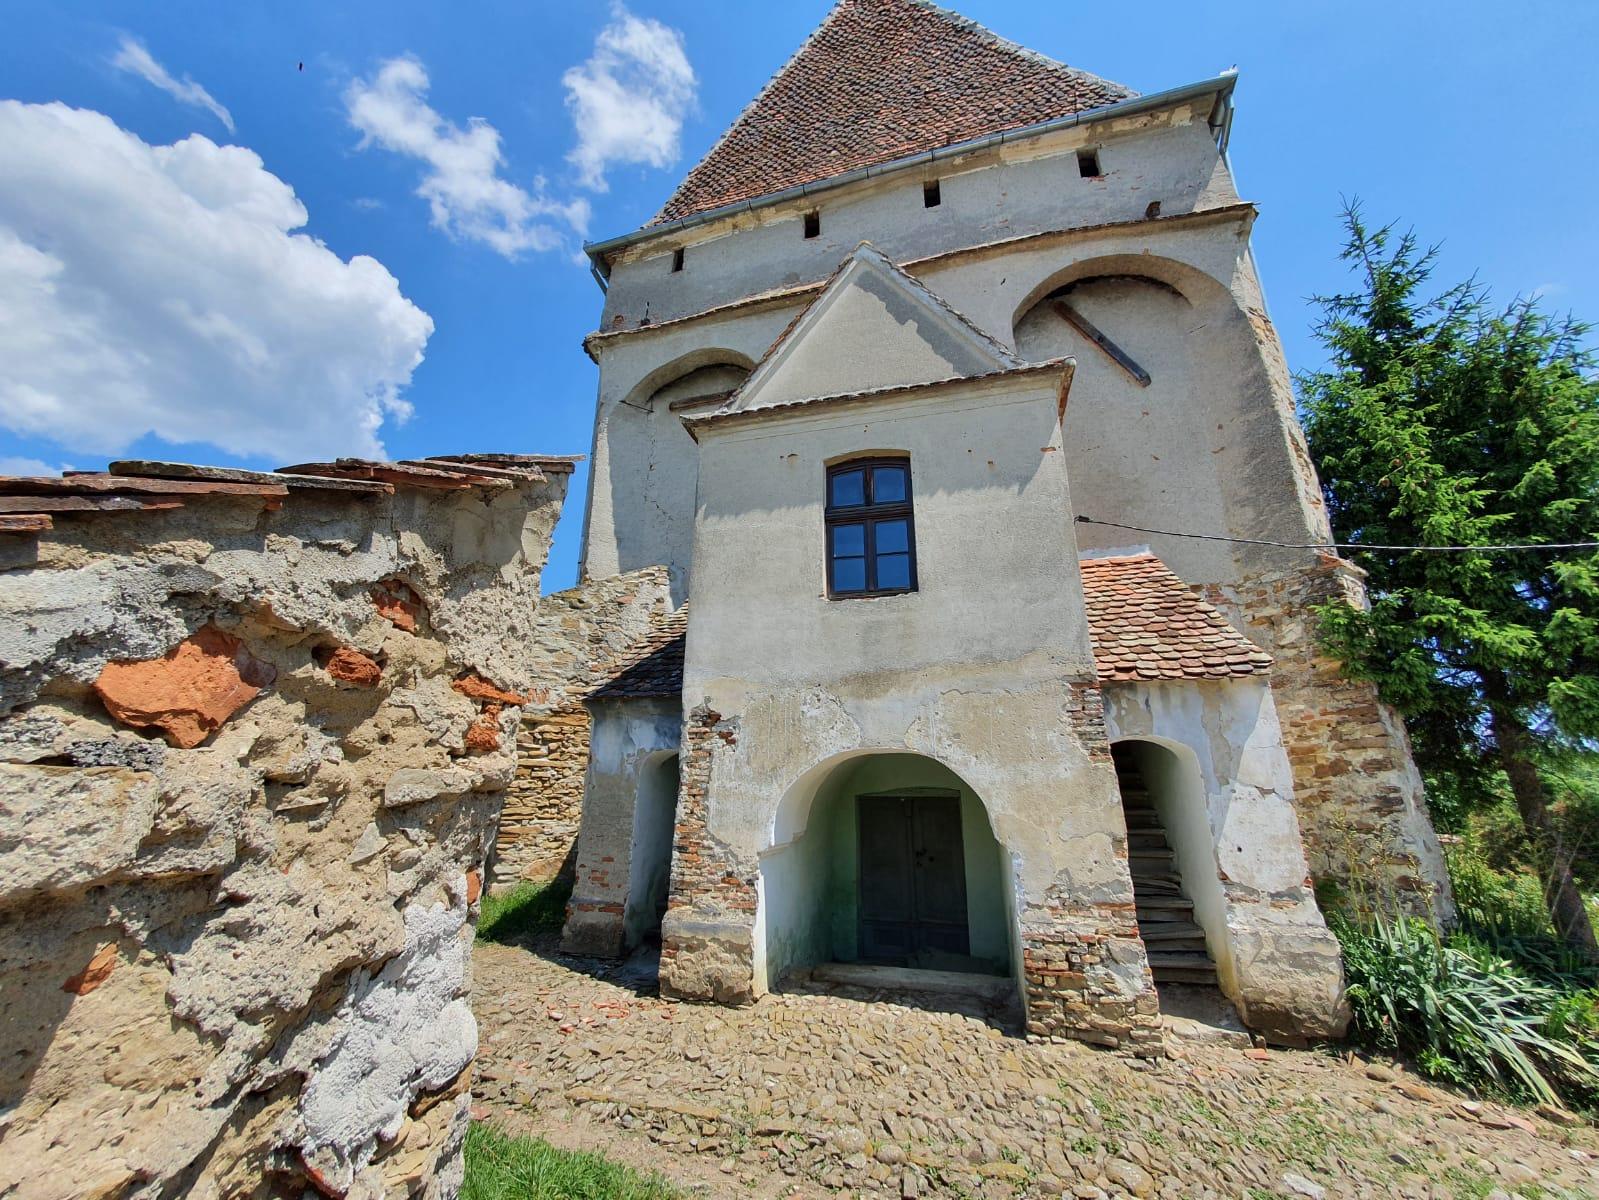 Bisericile fortificate din județul Brașov Selistat